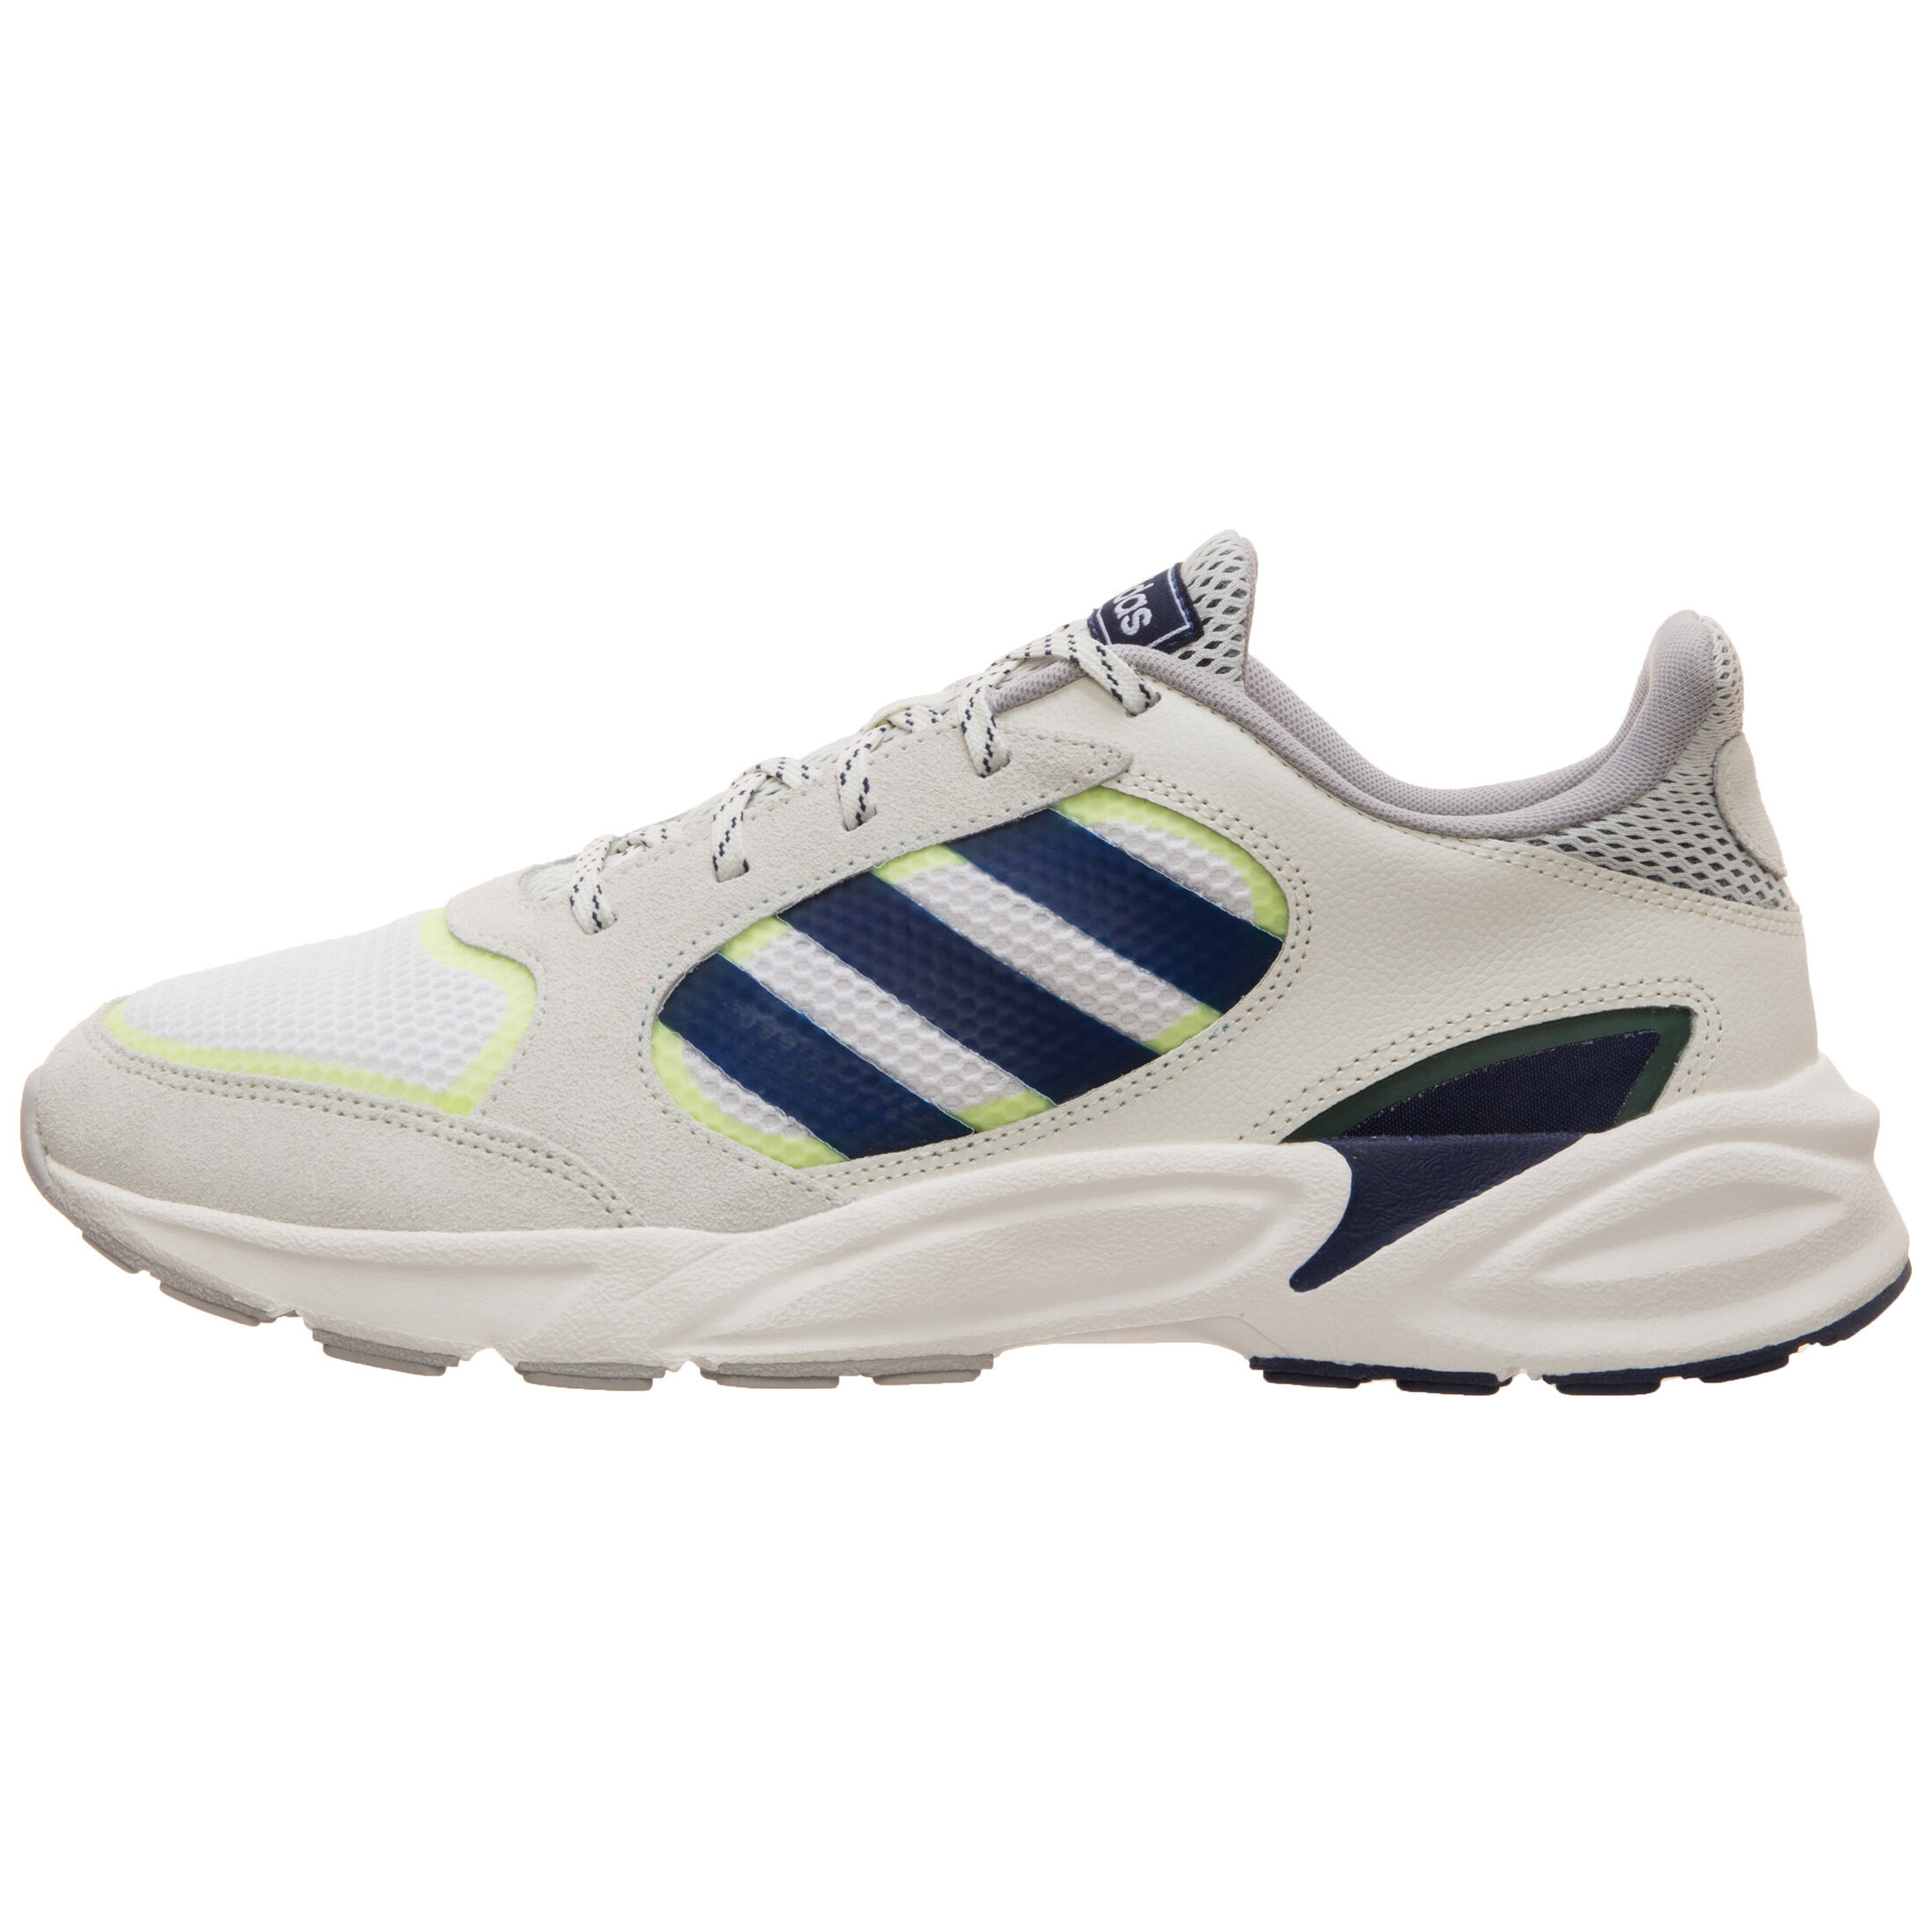 Details zu adidas Performance 90s Valasion Laufschuh Herren NEU Schuhe Turnschuhe